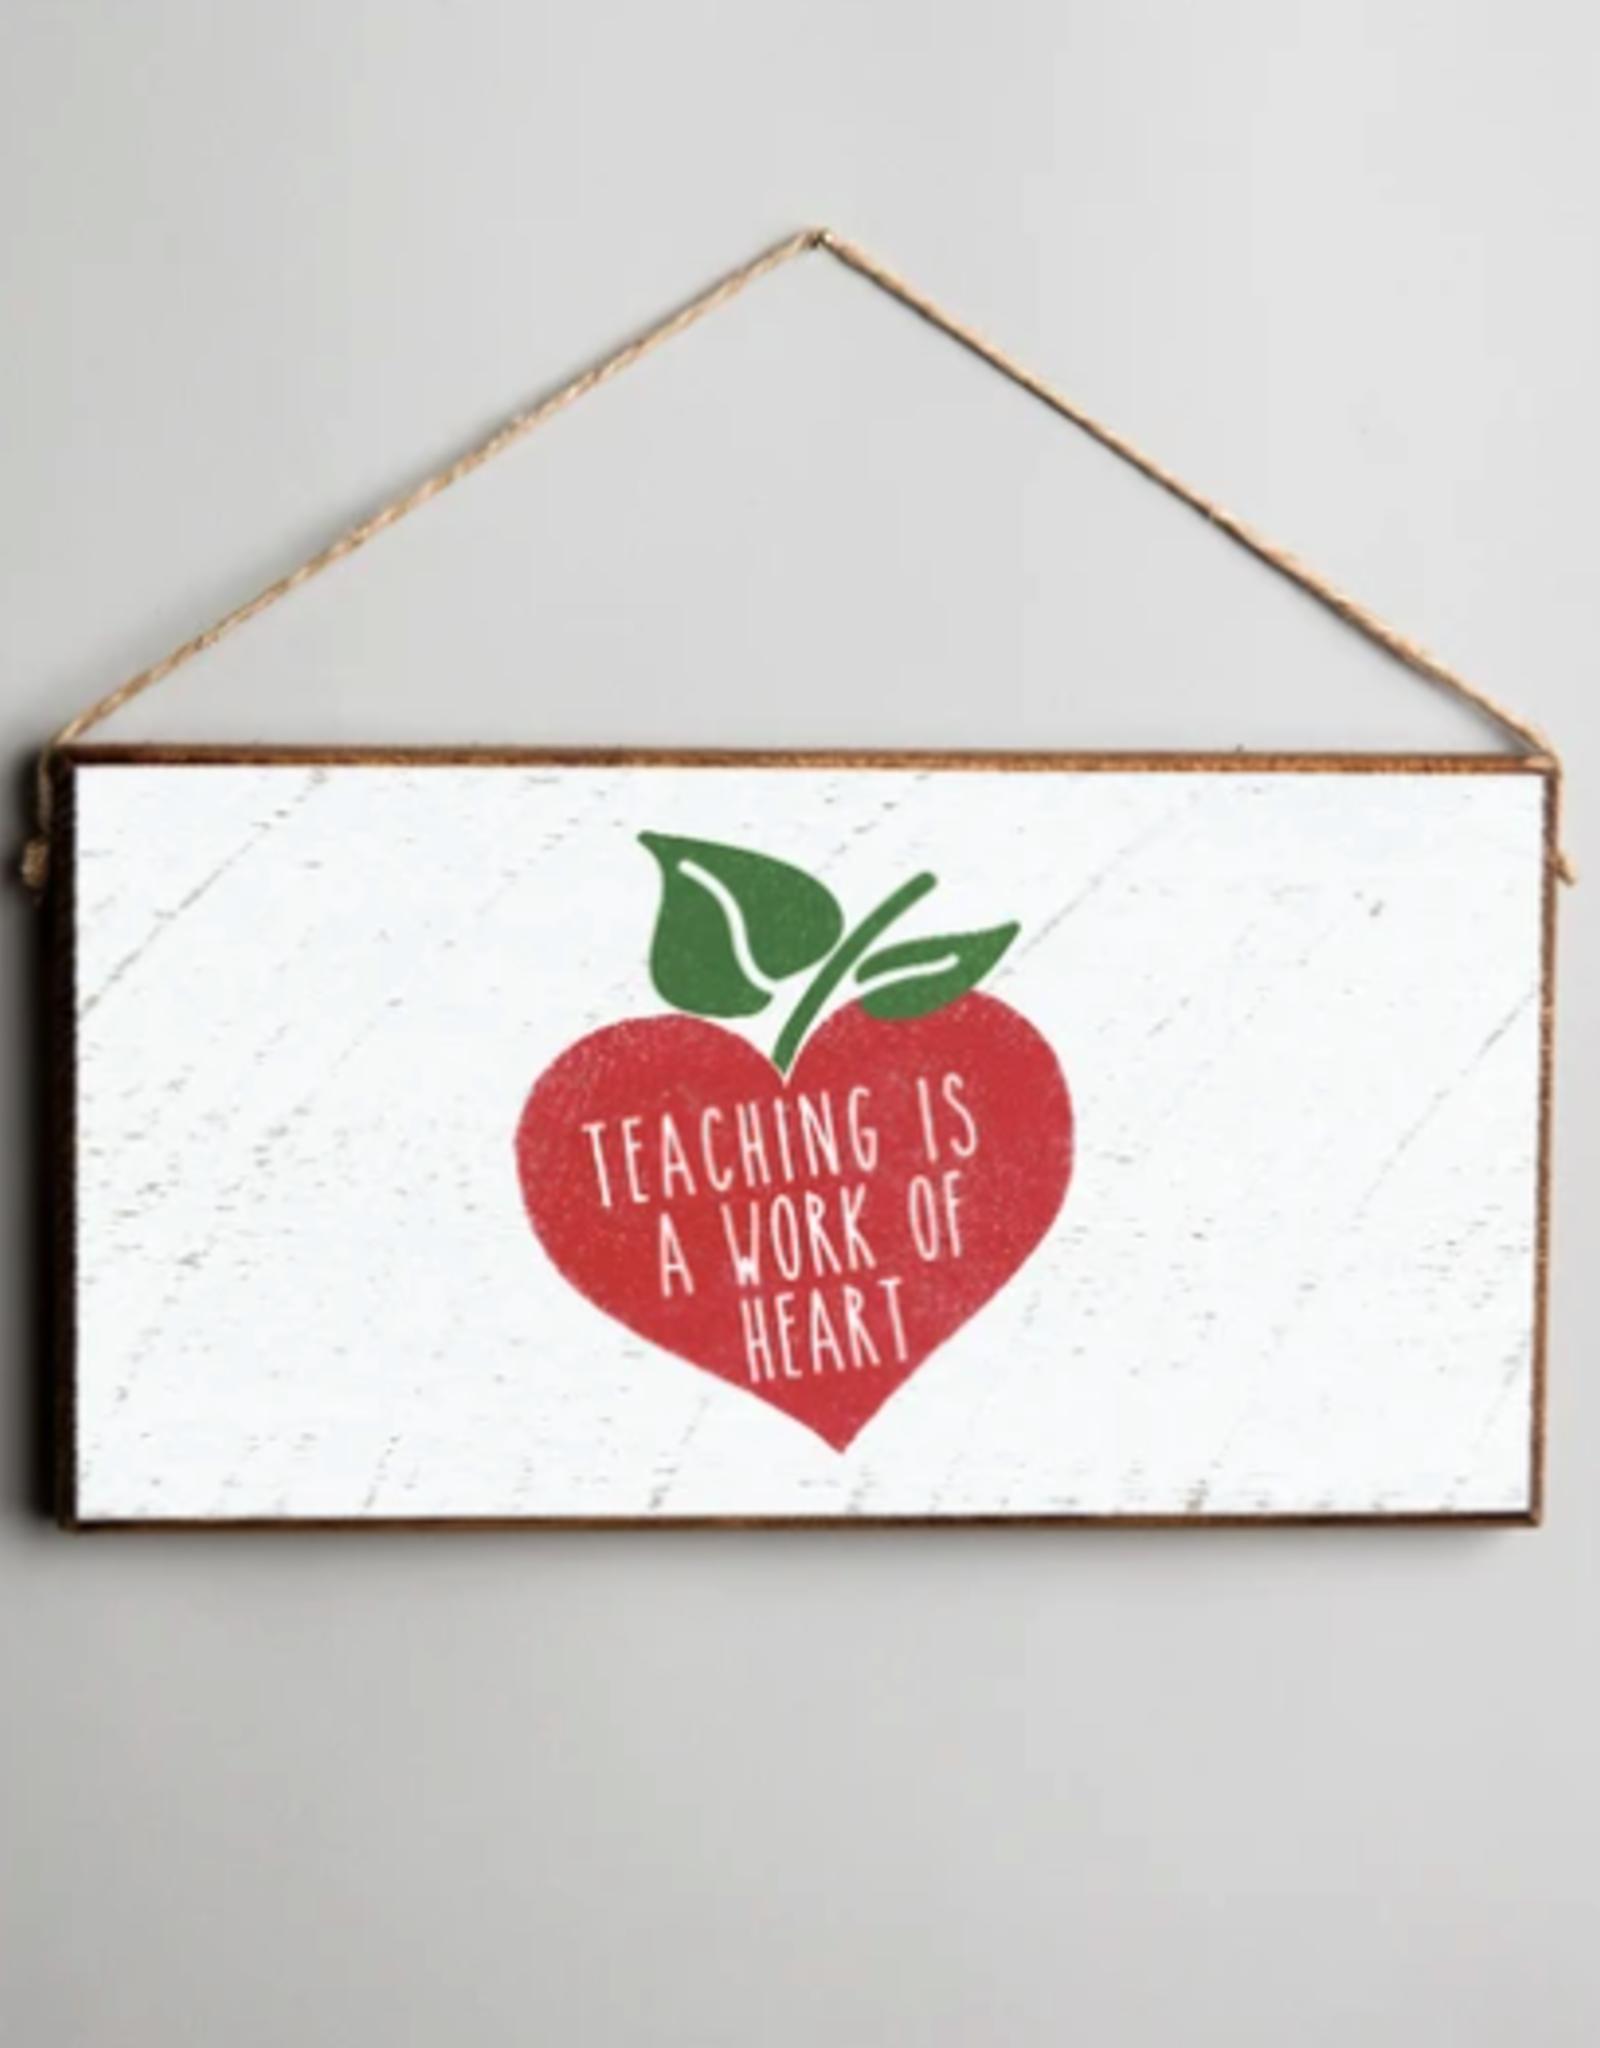 Rustic Marlin Rustic Marlin Mini Plank Teacher Heart